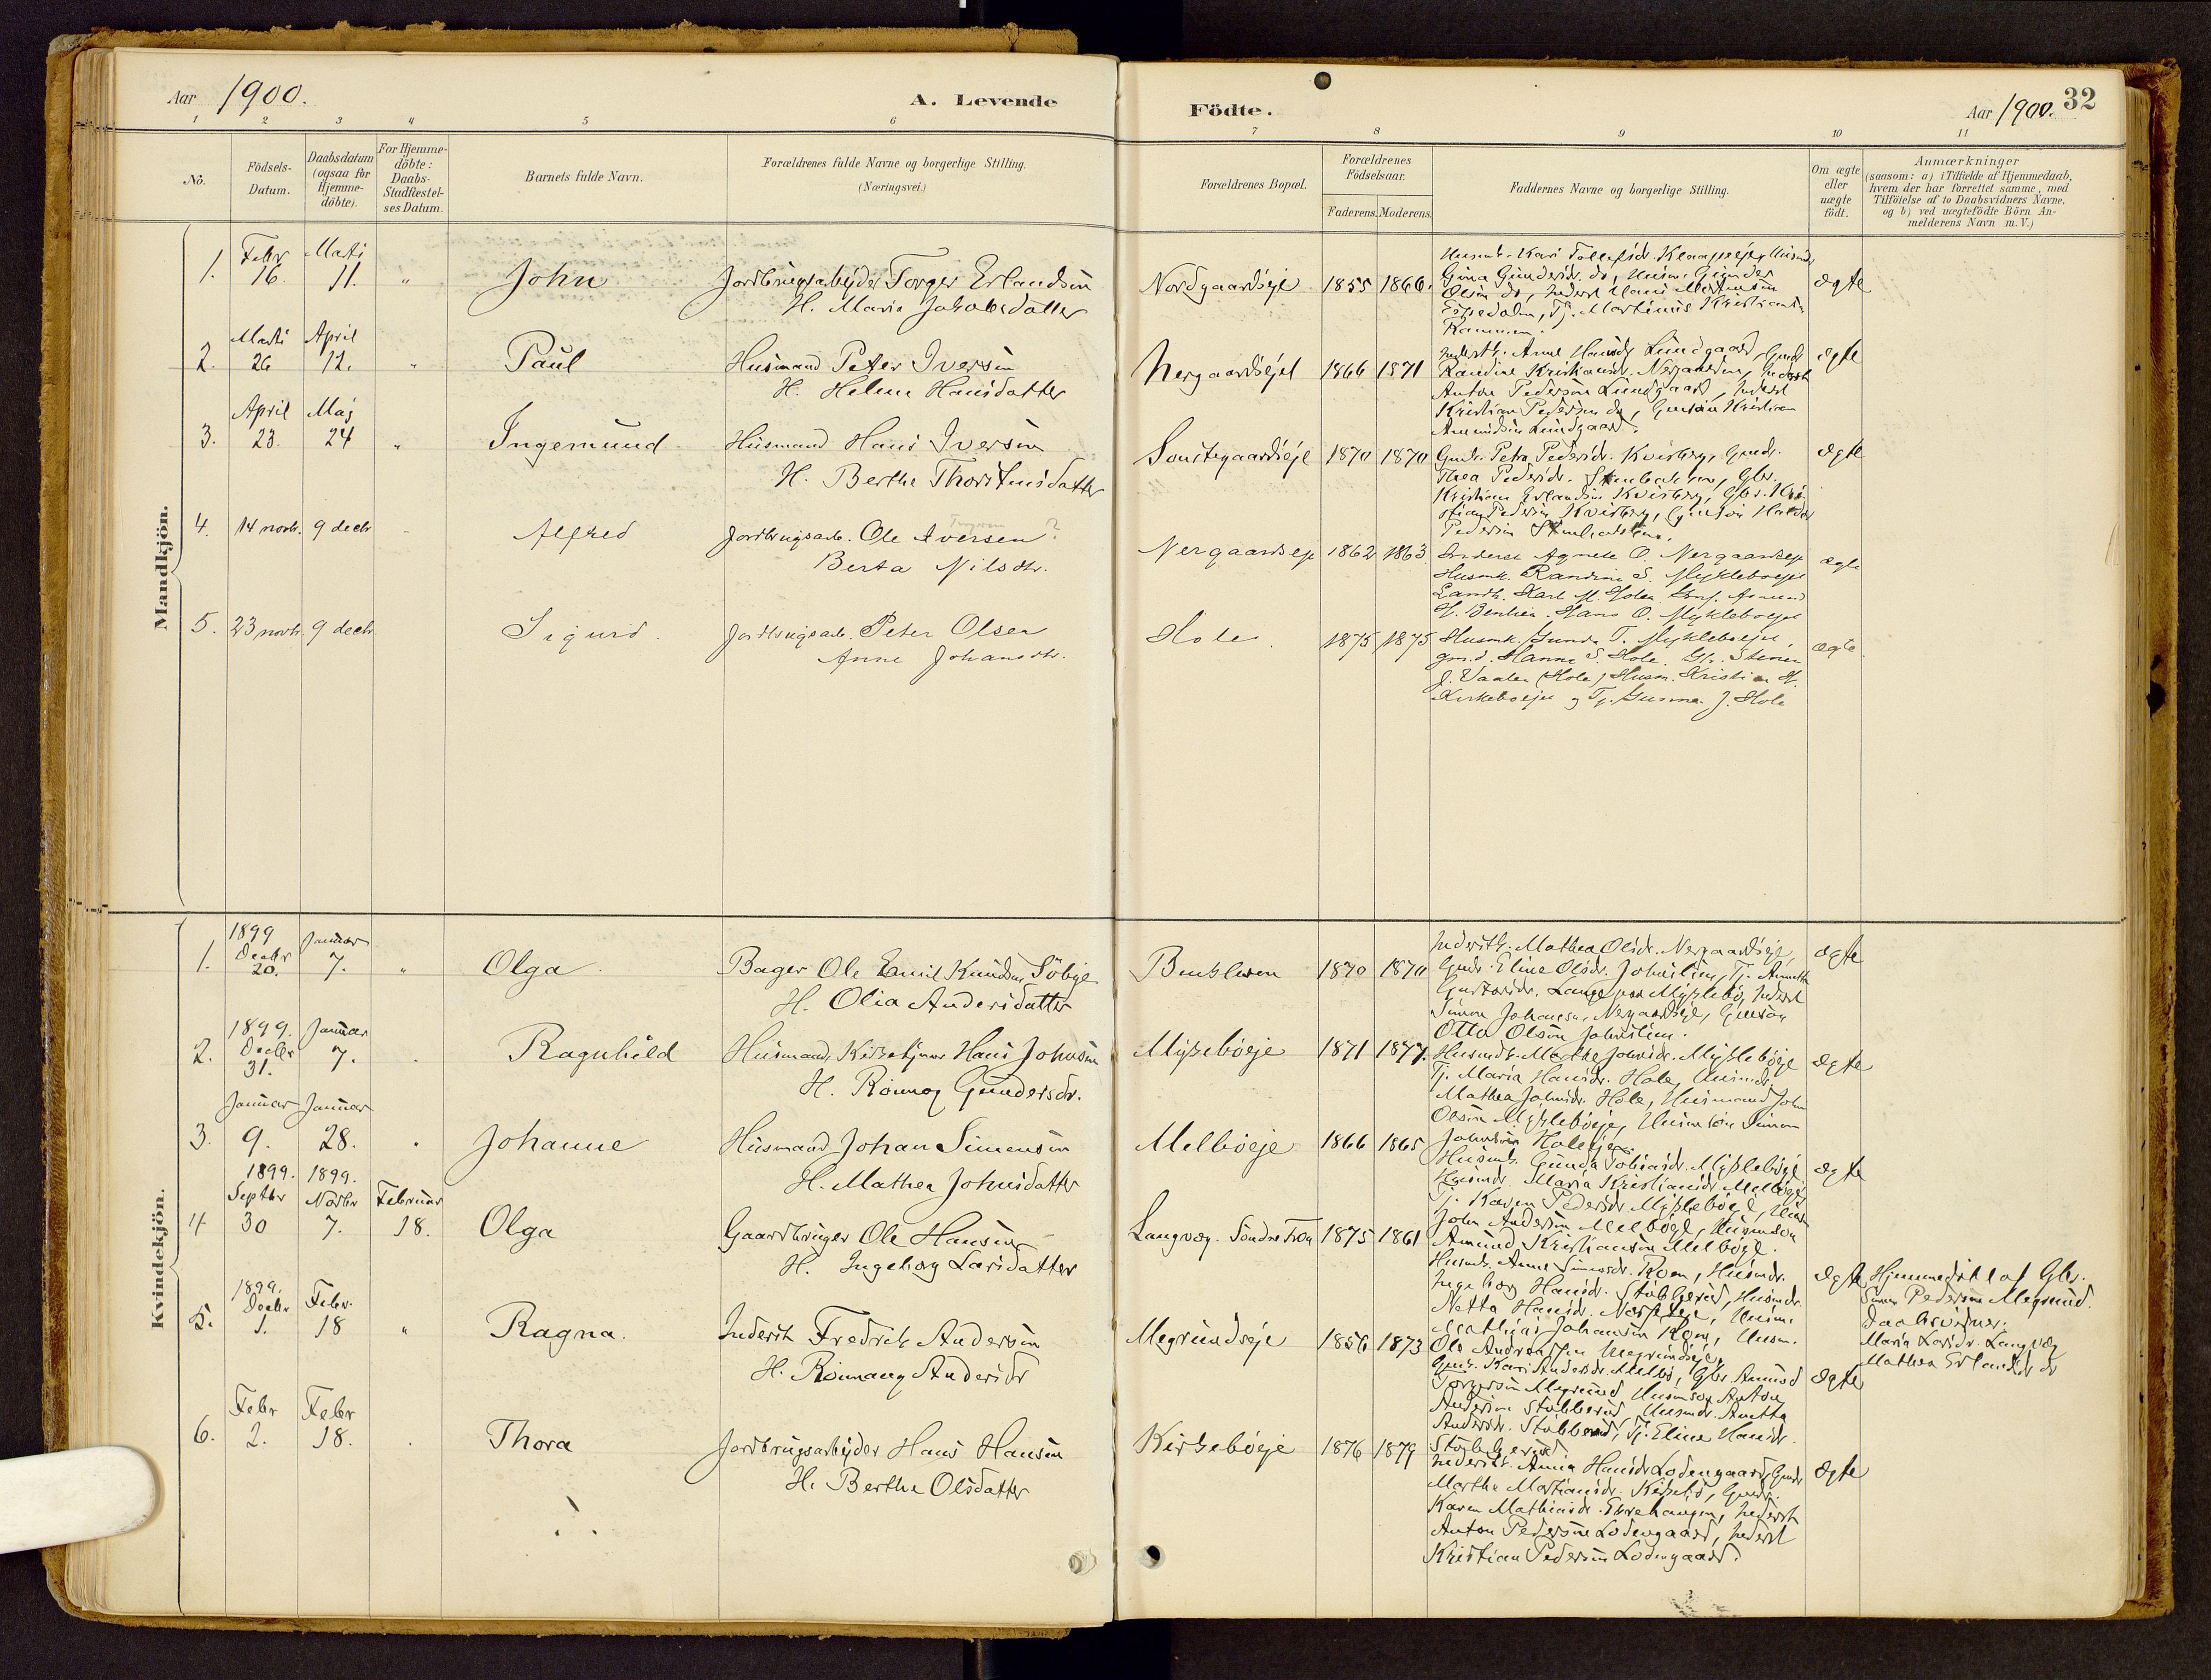 SAH, Vestre Gausdal prestekontor, Ministerialbok nr. 2, 1887-1918, s. 32